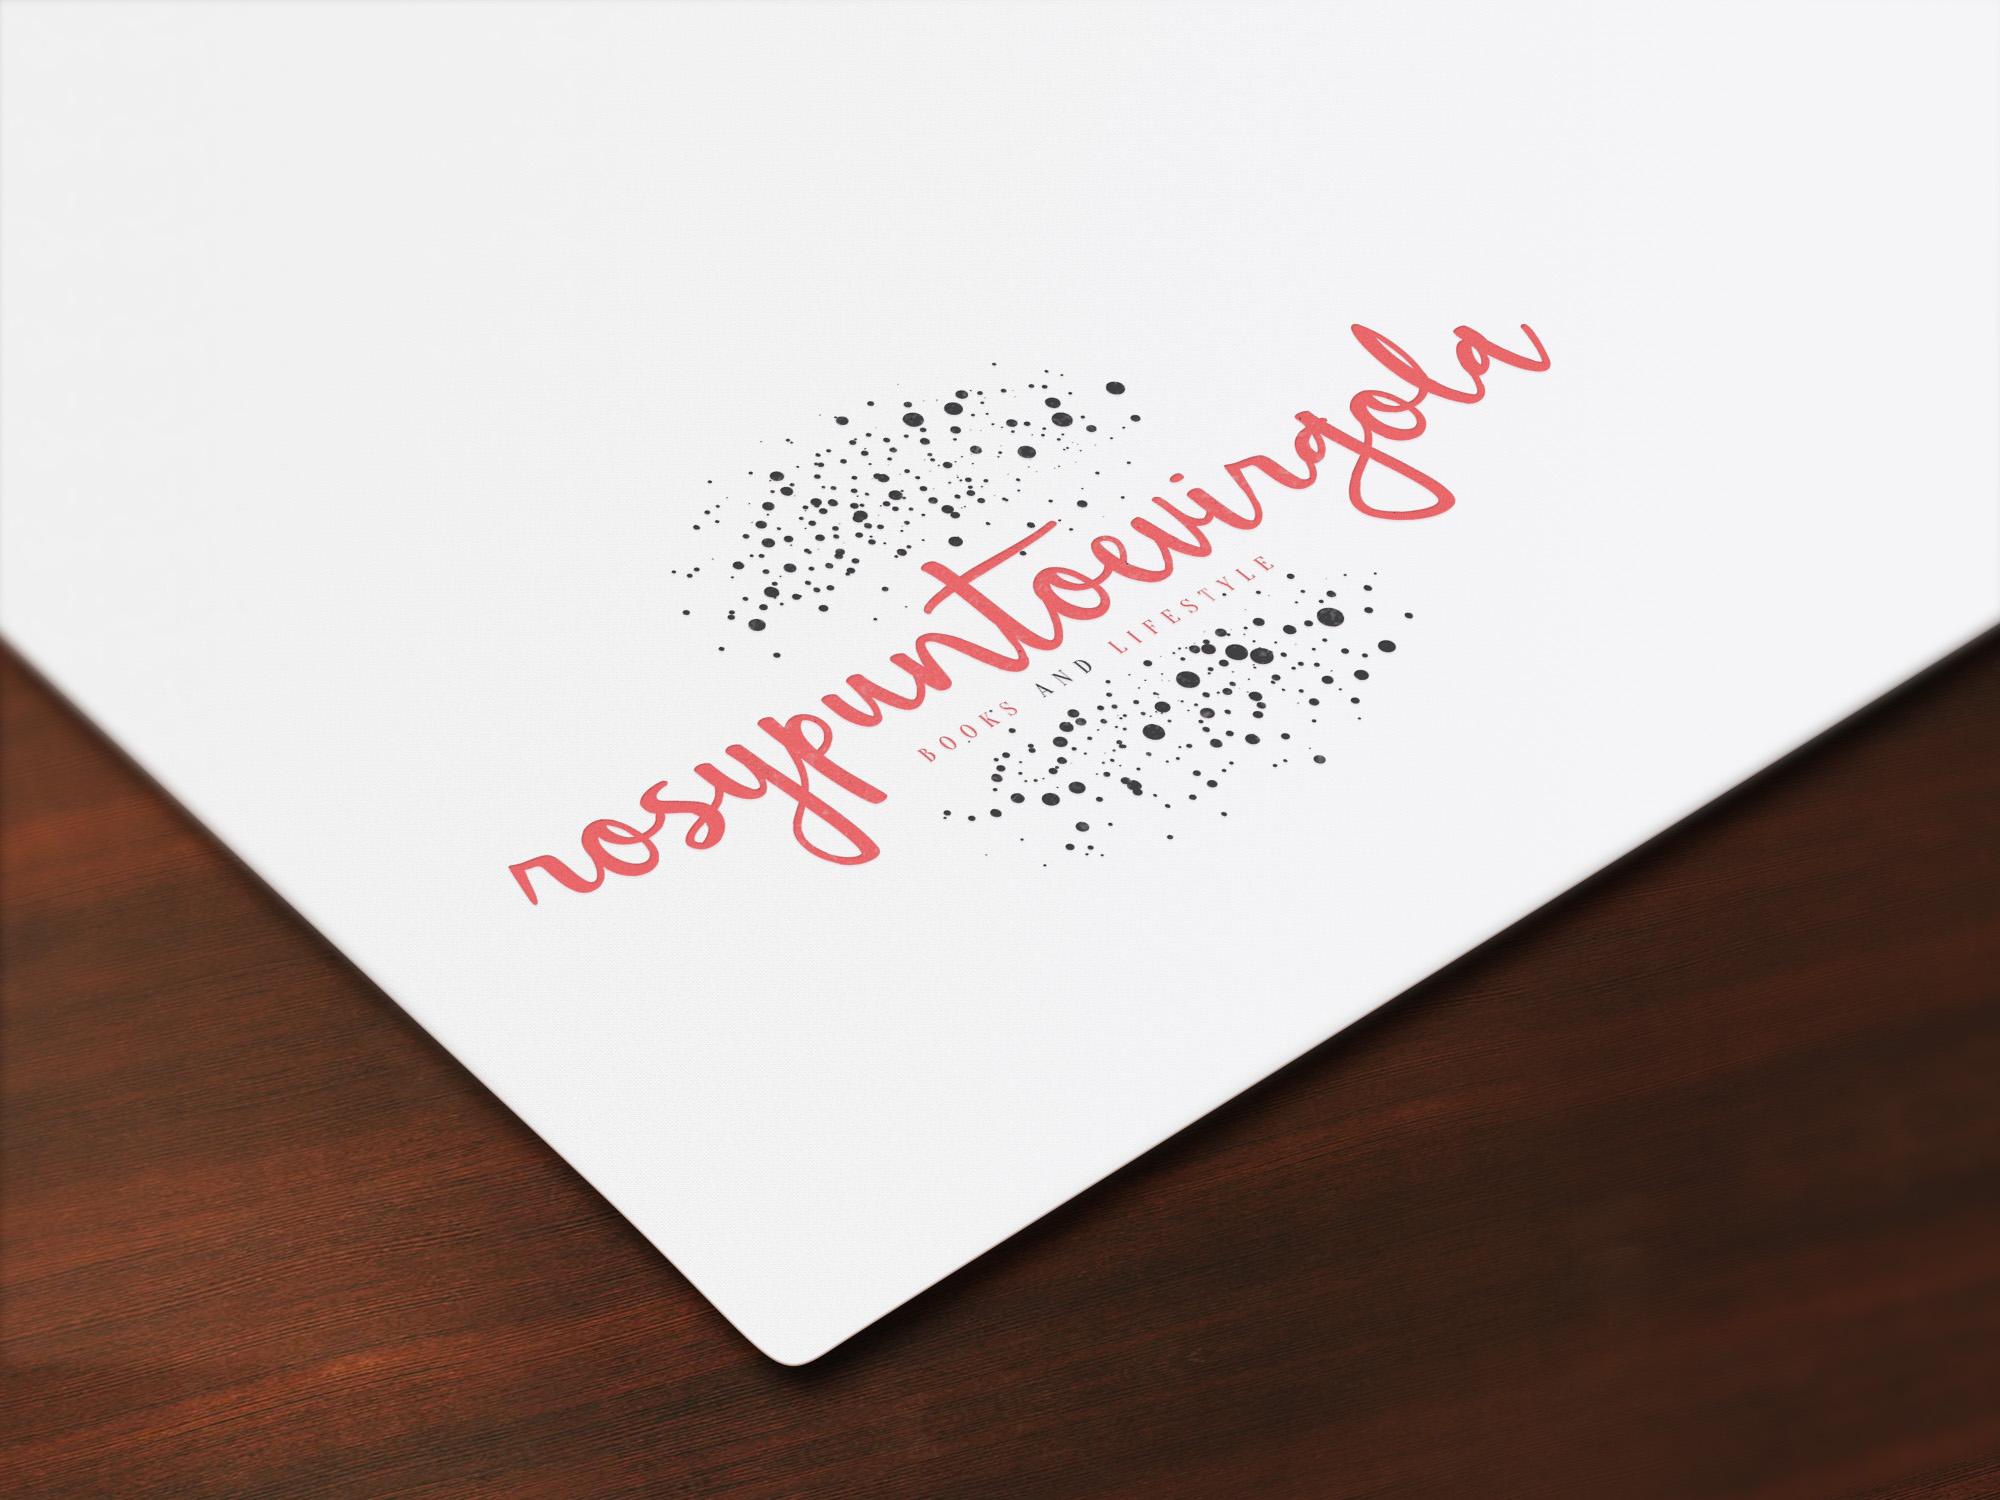 Rosypuntoevirgola Logo